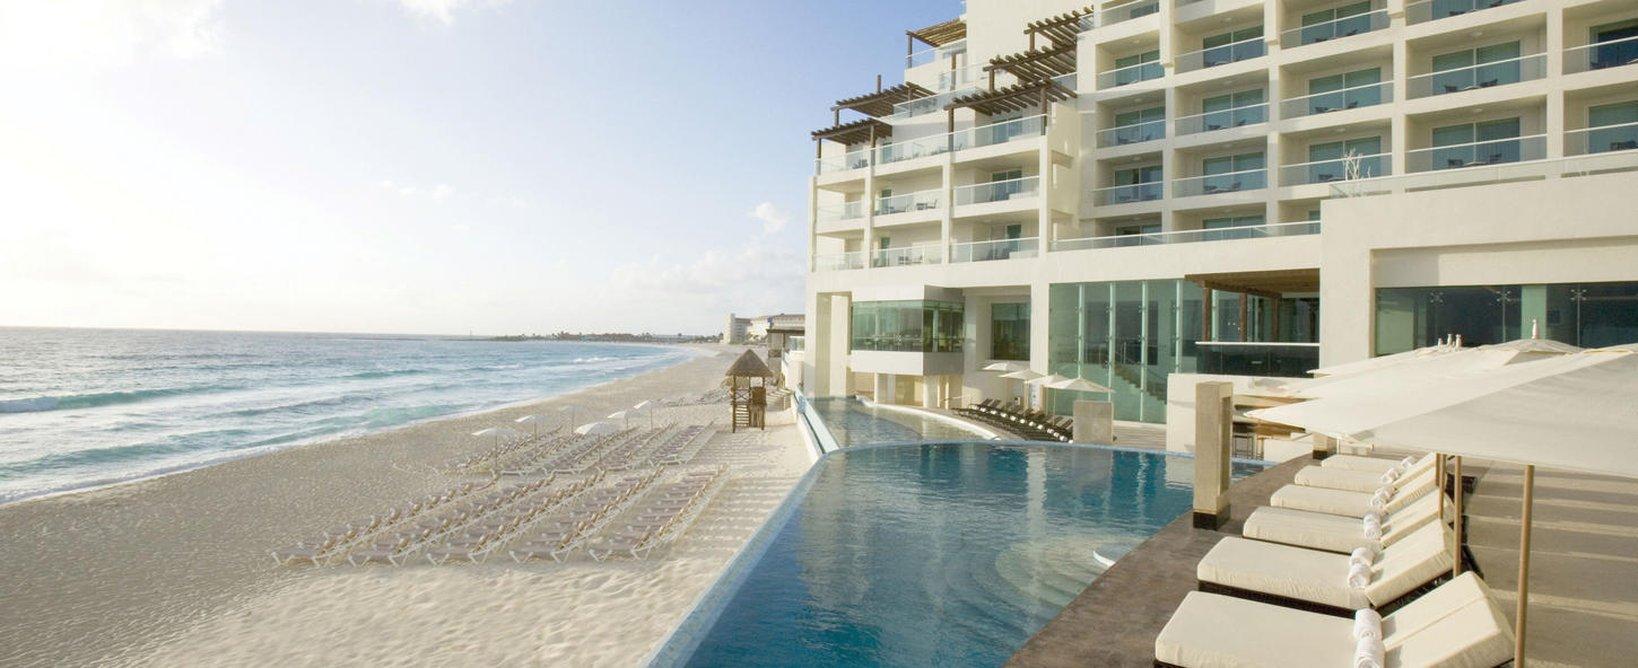 Sun Palace Cancun Top All Inclusive Resort